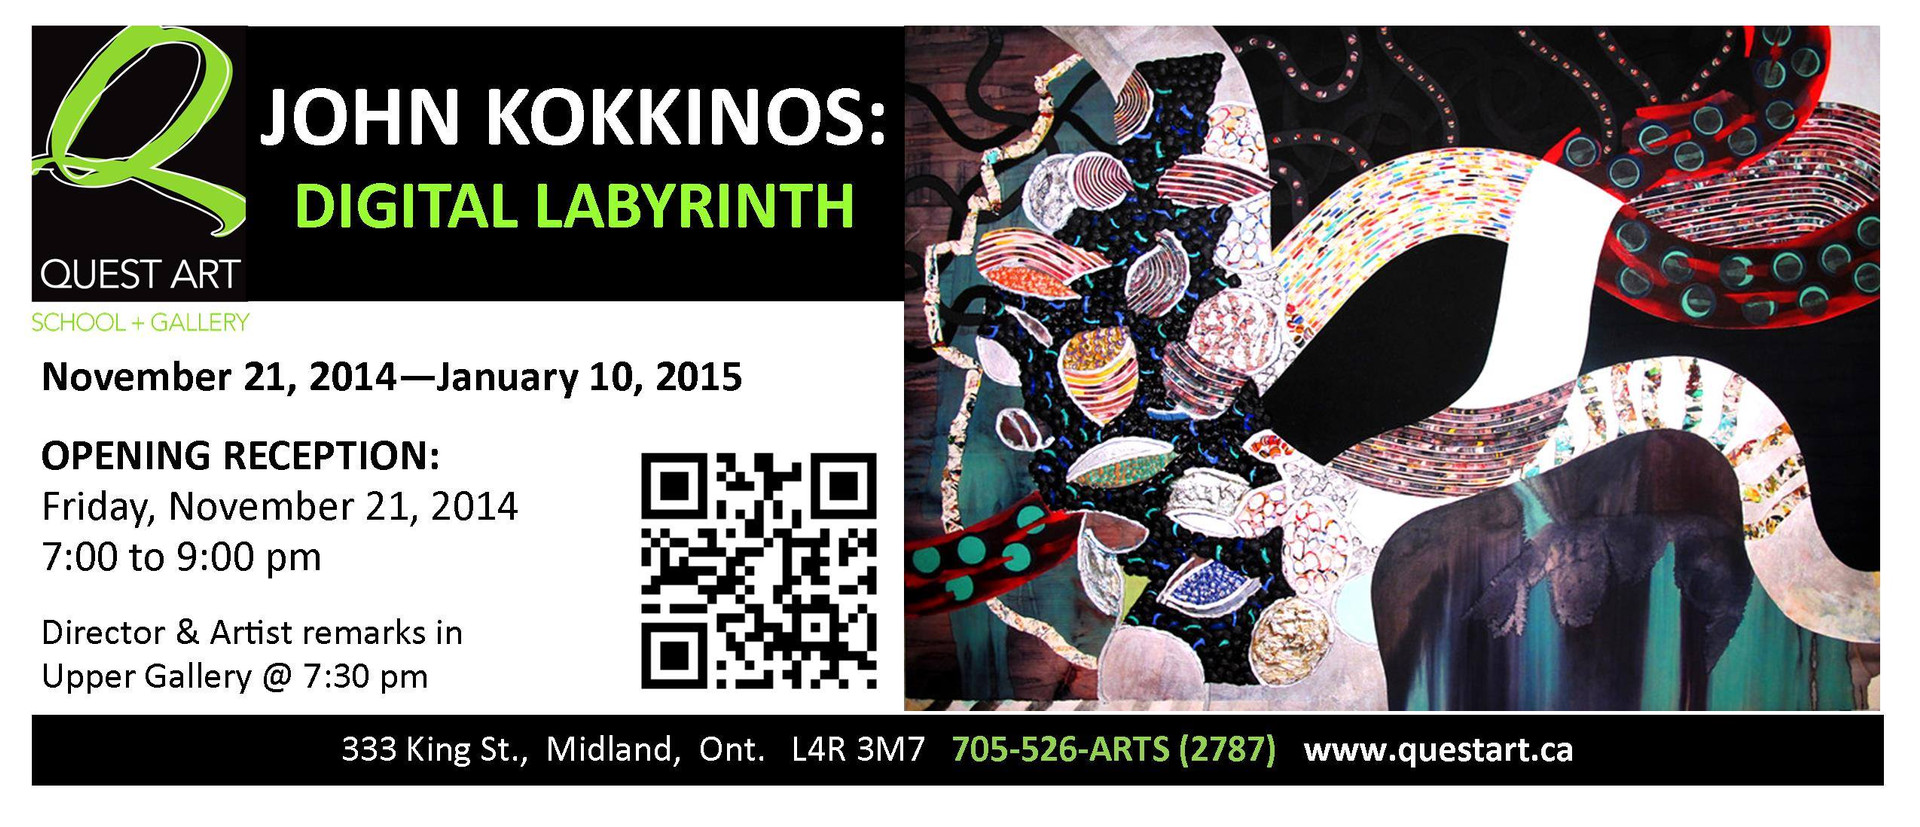 Digital Labrynth, John Kokkinos, Curated